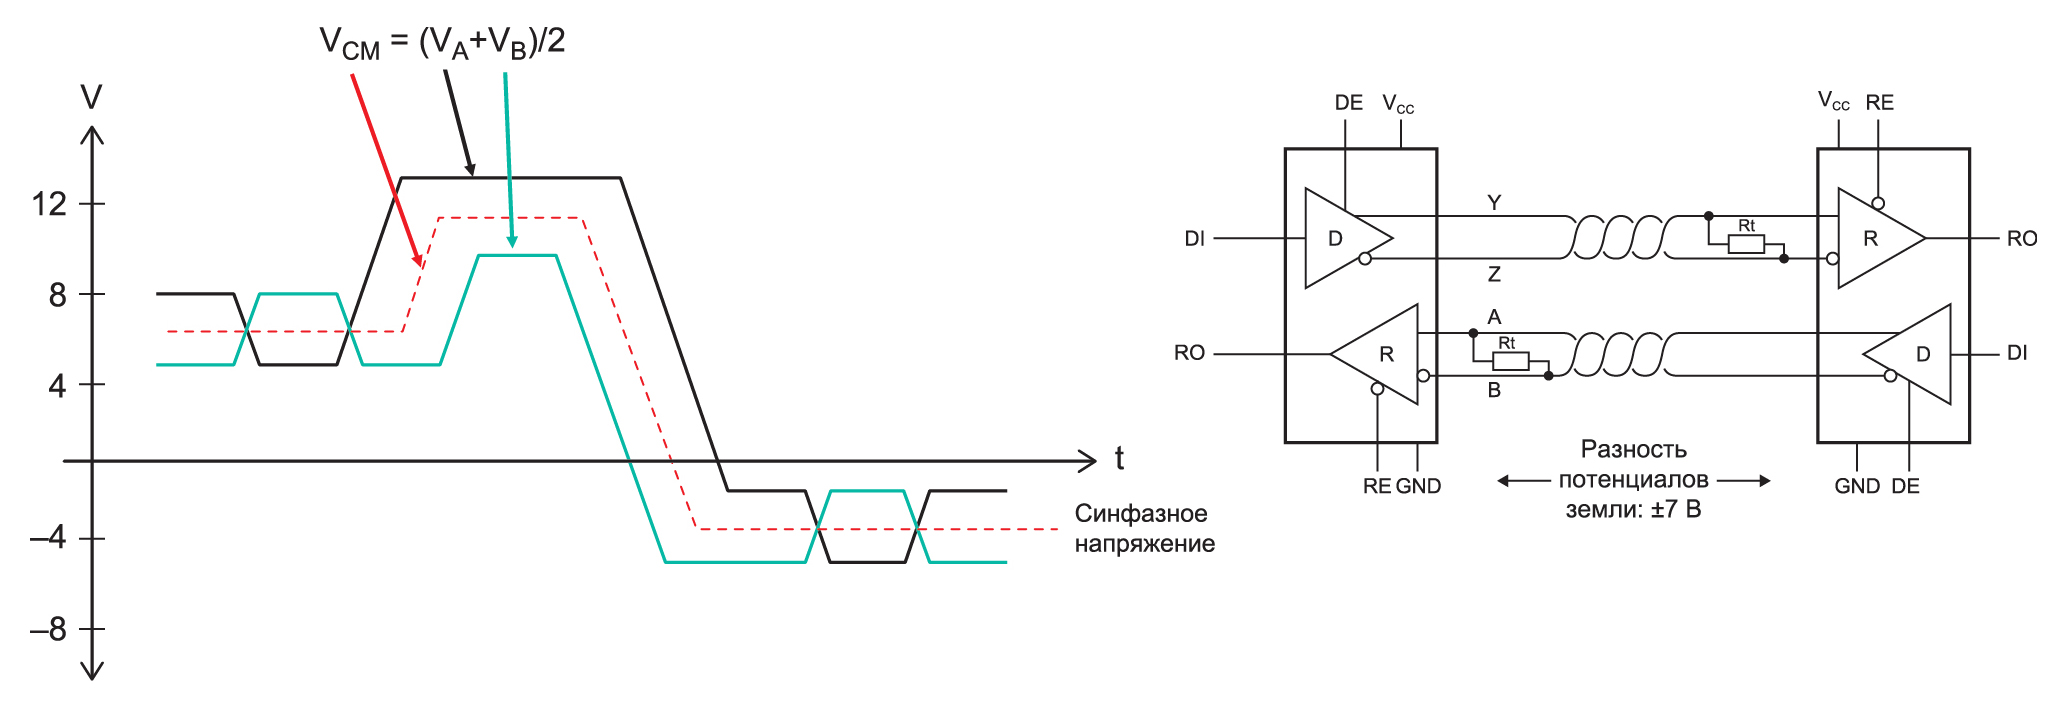 Пояснение параметра CMR на примере трансивера RS 485